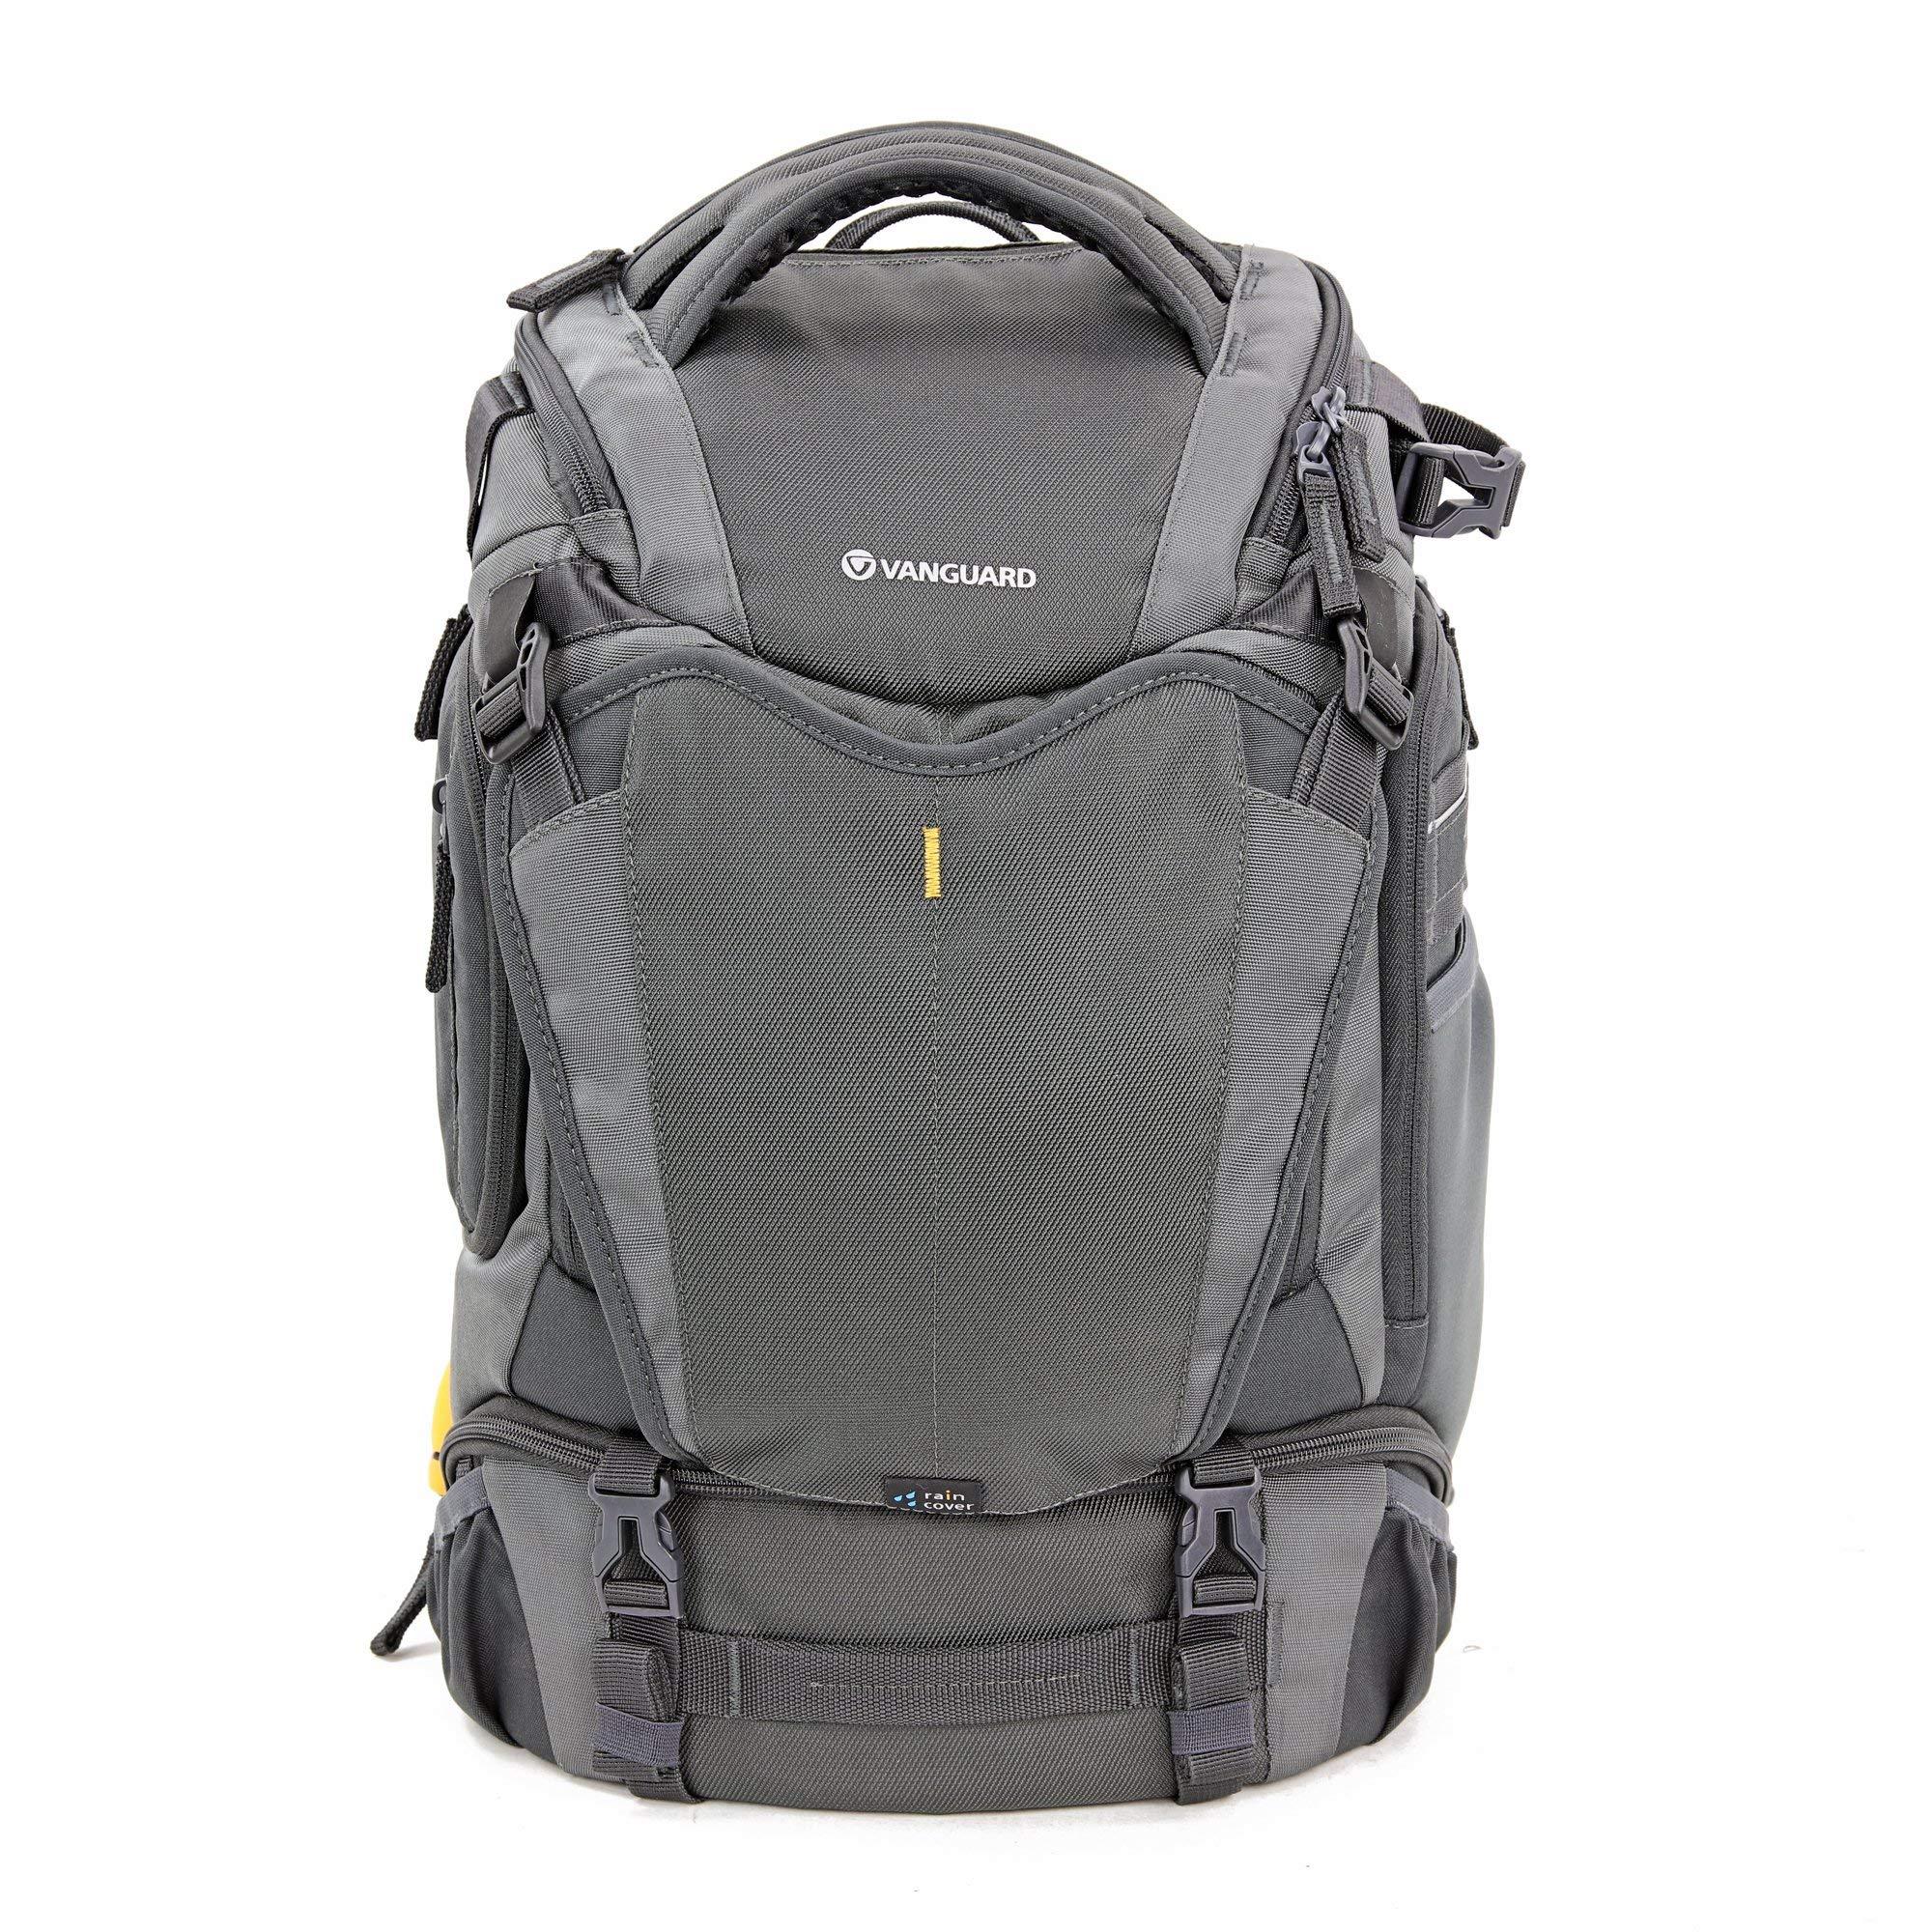 Vanguard Alta Sky 45D Camera Backpack for Sony, Nikon, Canon, DSLR, Drones, Grey (Renewed)